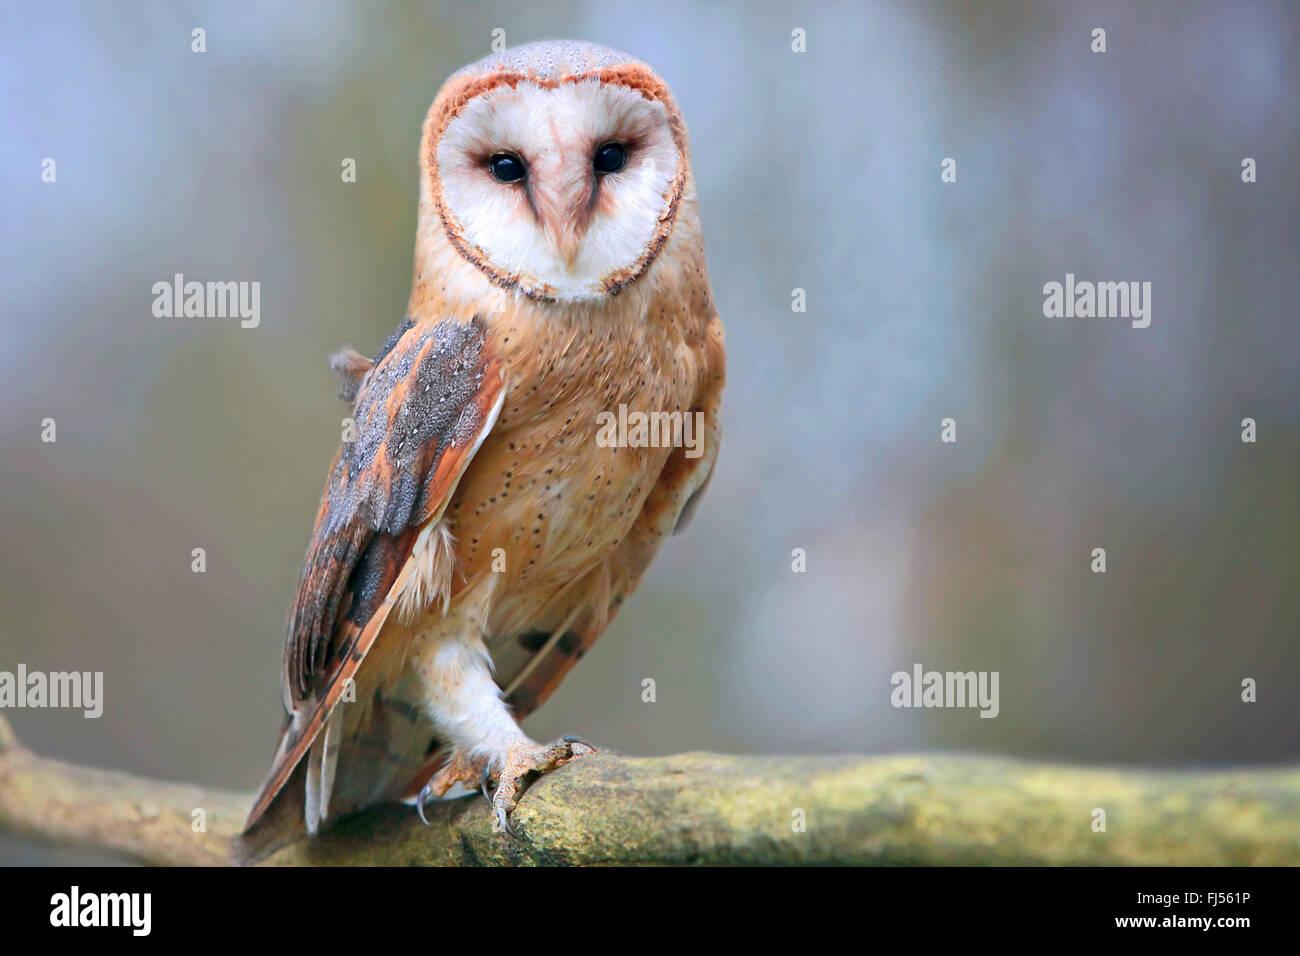 Barn owl (Tyto alba), on a branch, Germany, Bavaria, Niederbayern, Lower Bavaria - Stock Image